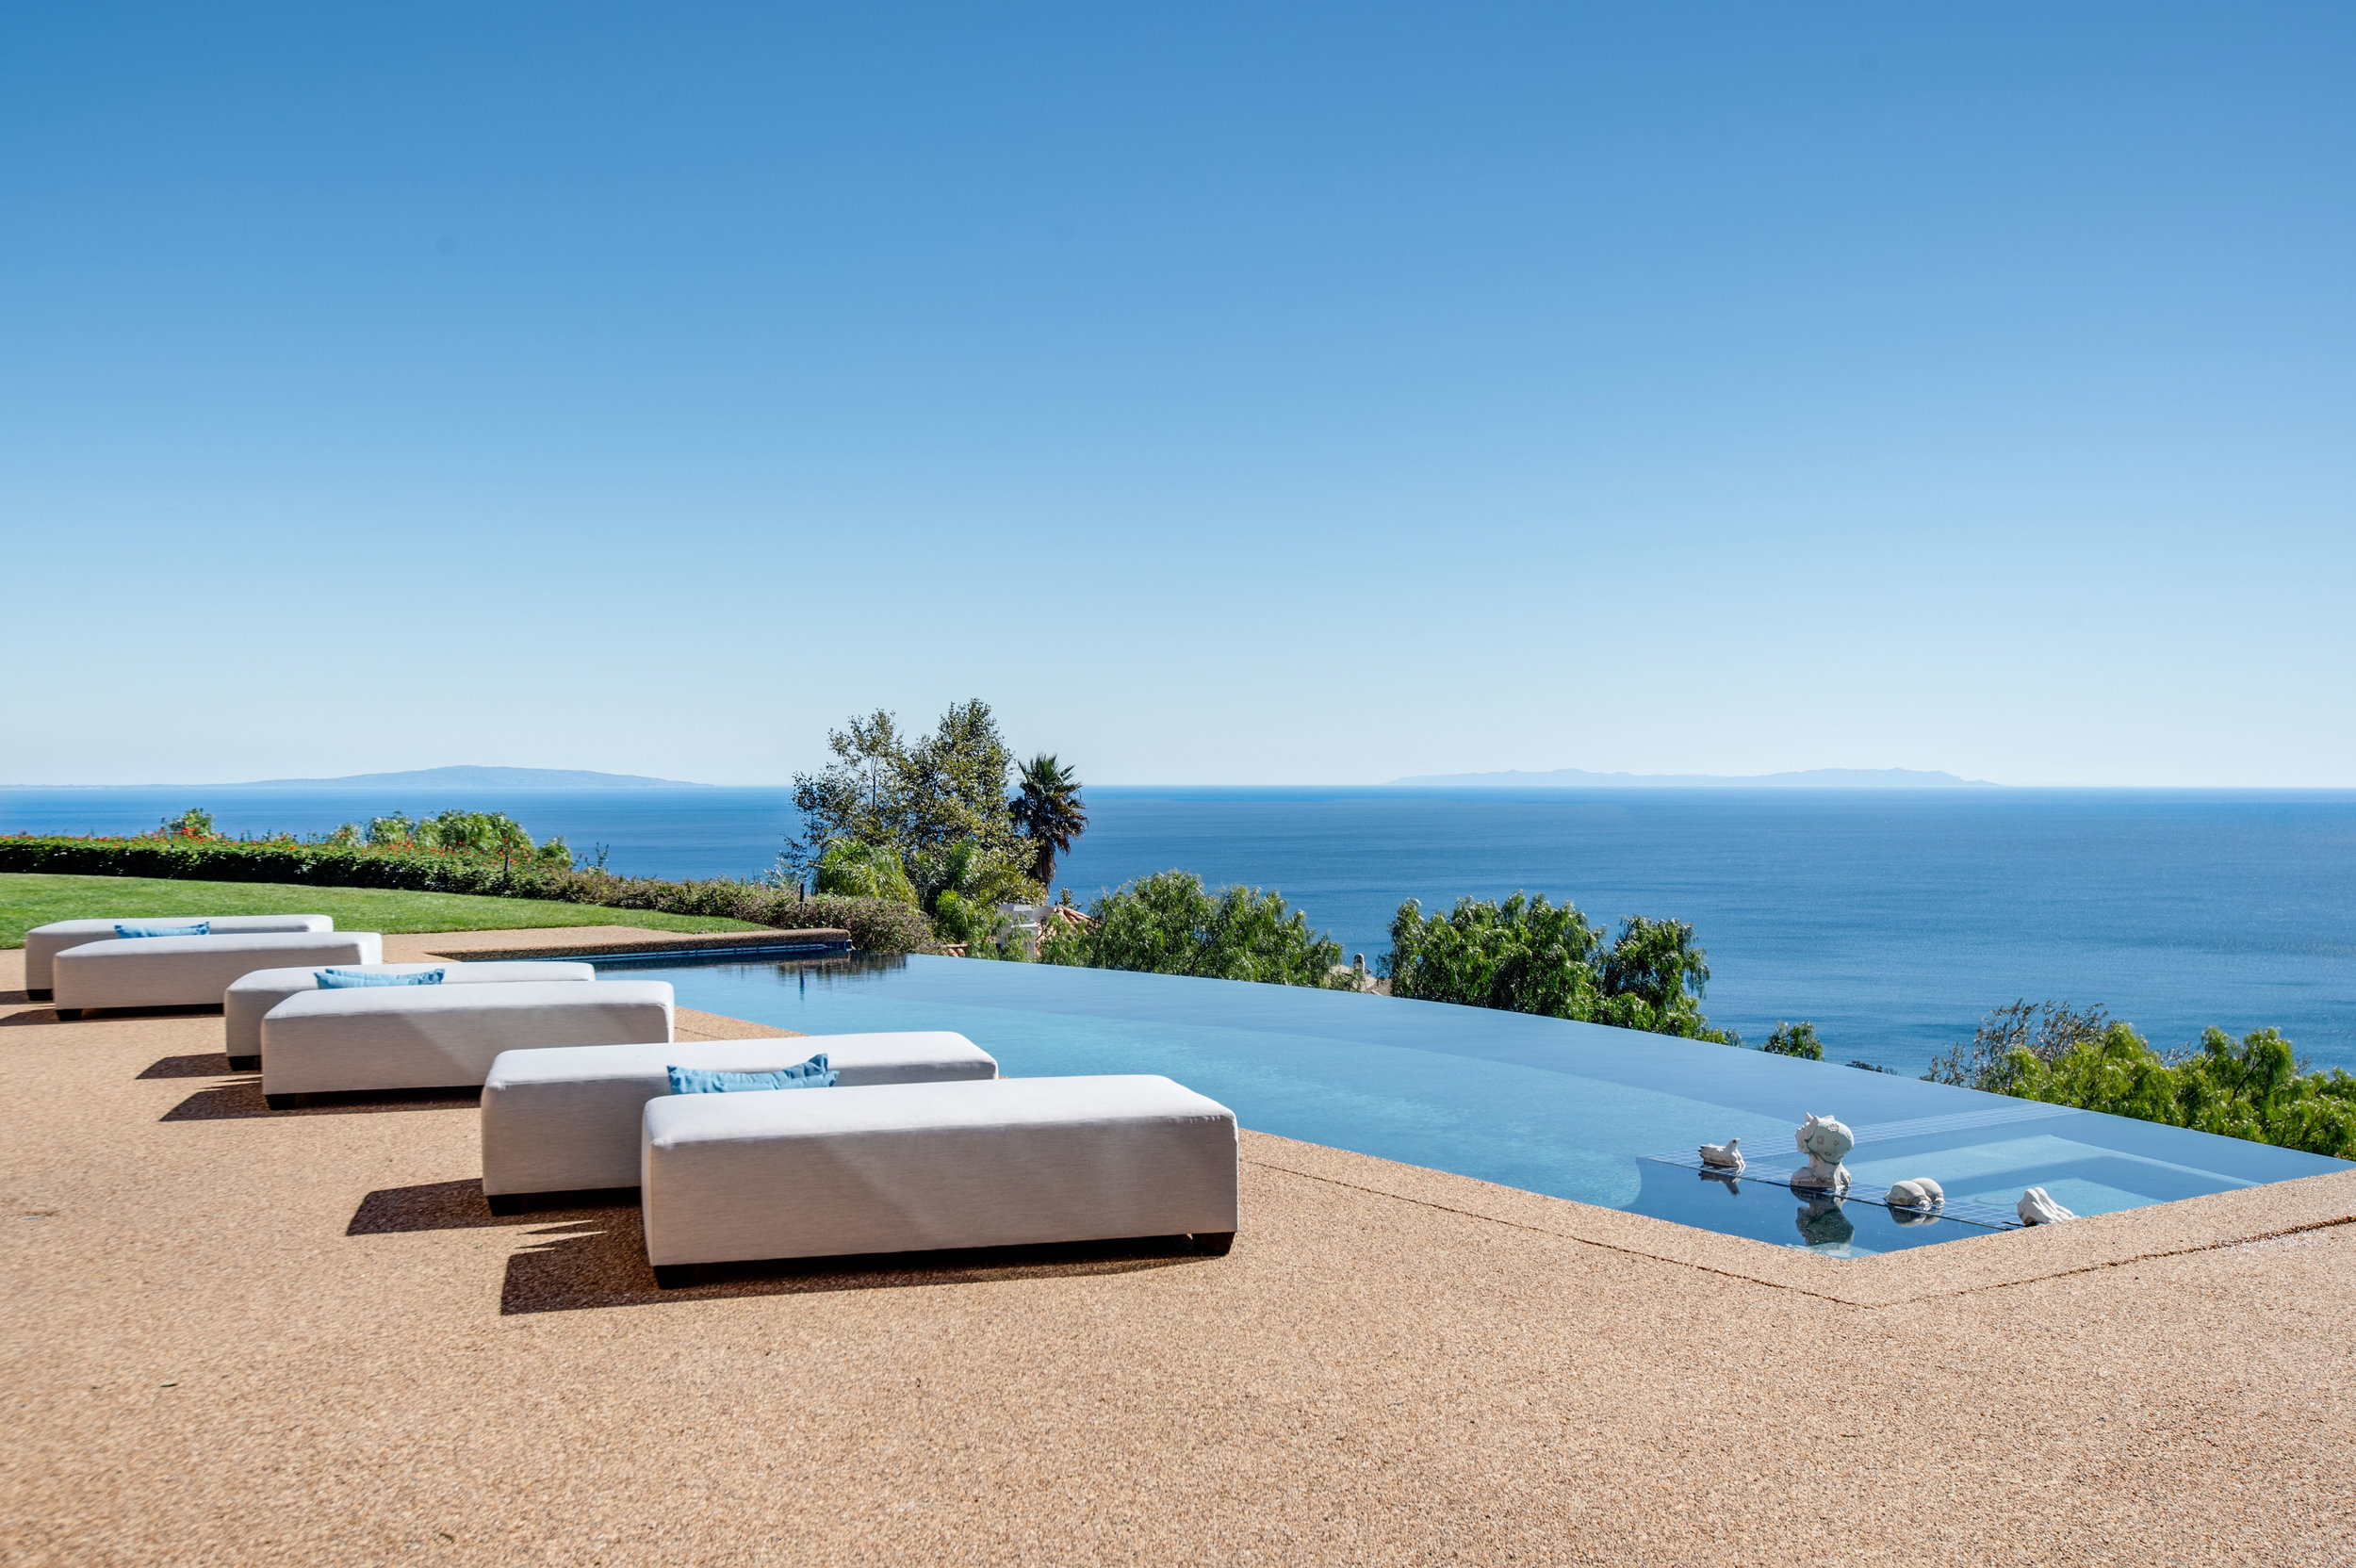 031 Pool Ocean View 27475 Latigo Bay View Drive For Sale Lease The Malibu Life Team Luxury Real Estate.jpg